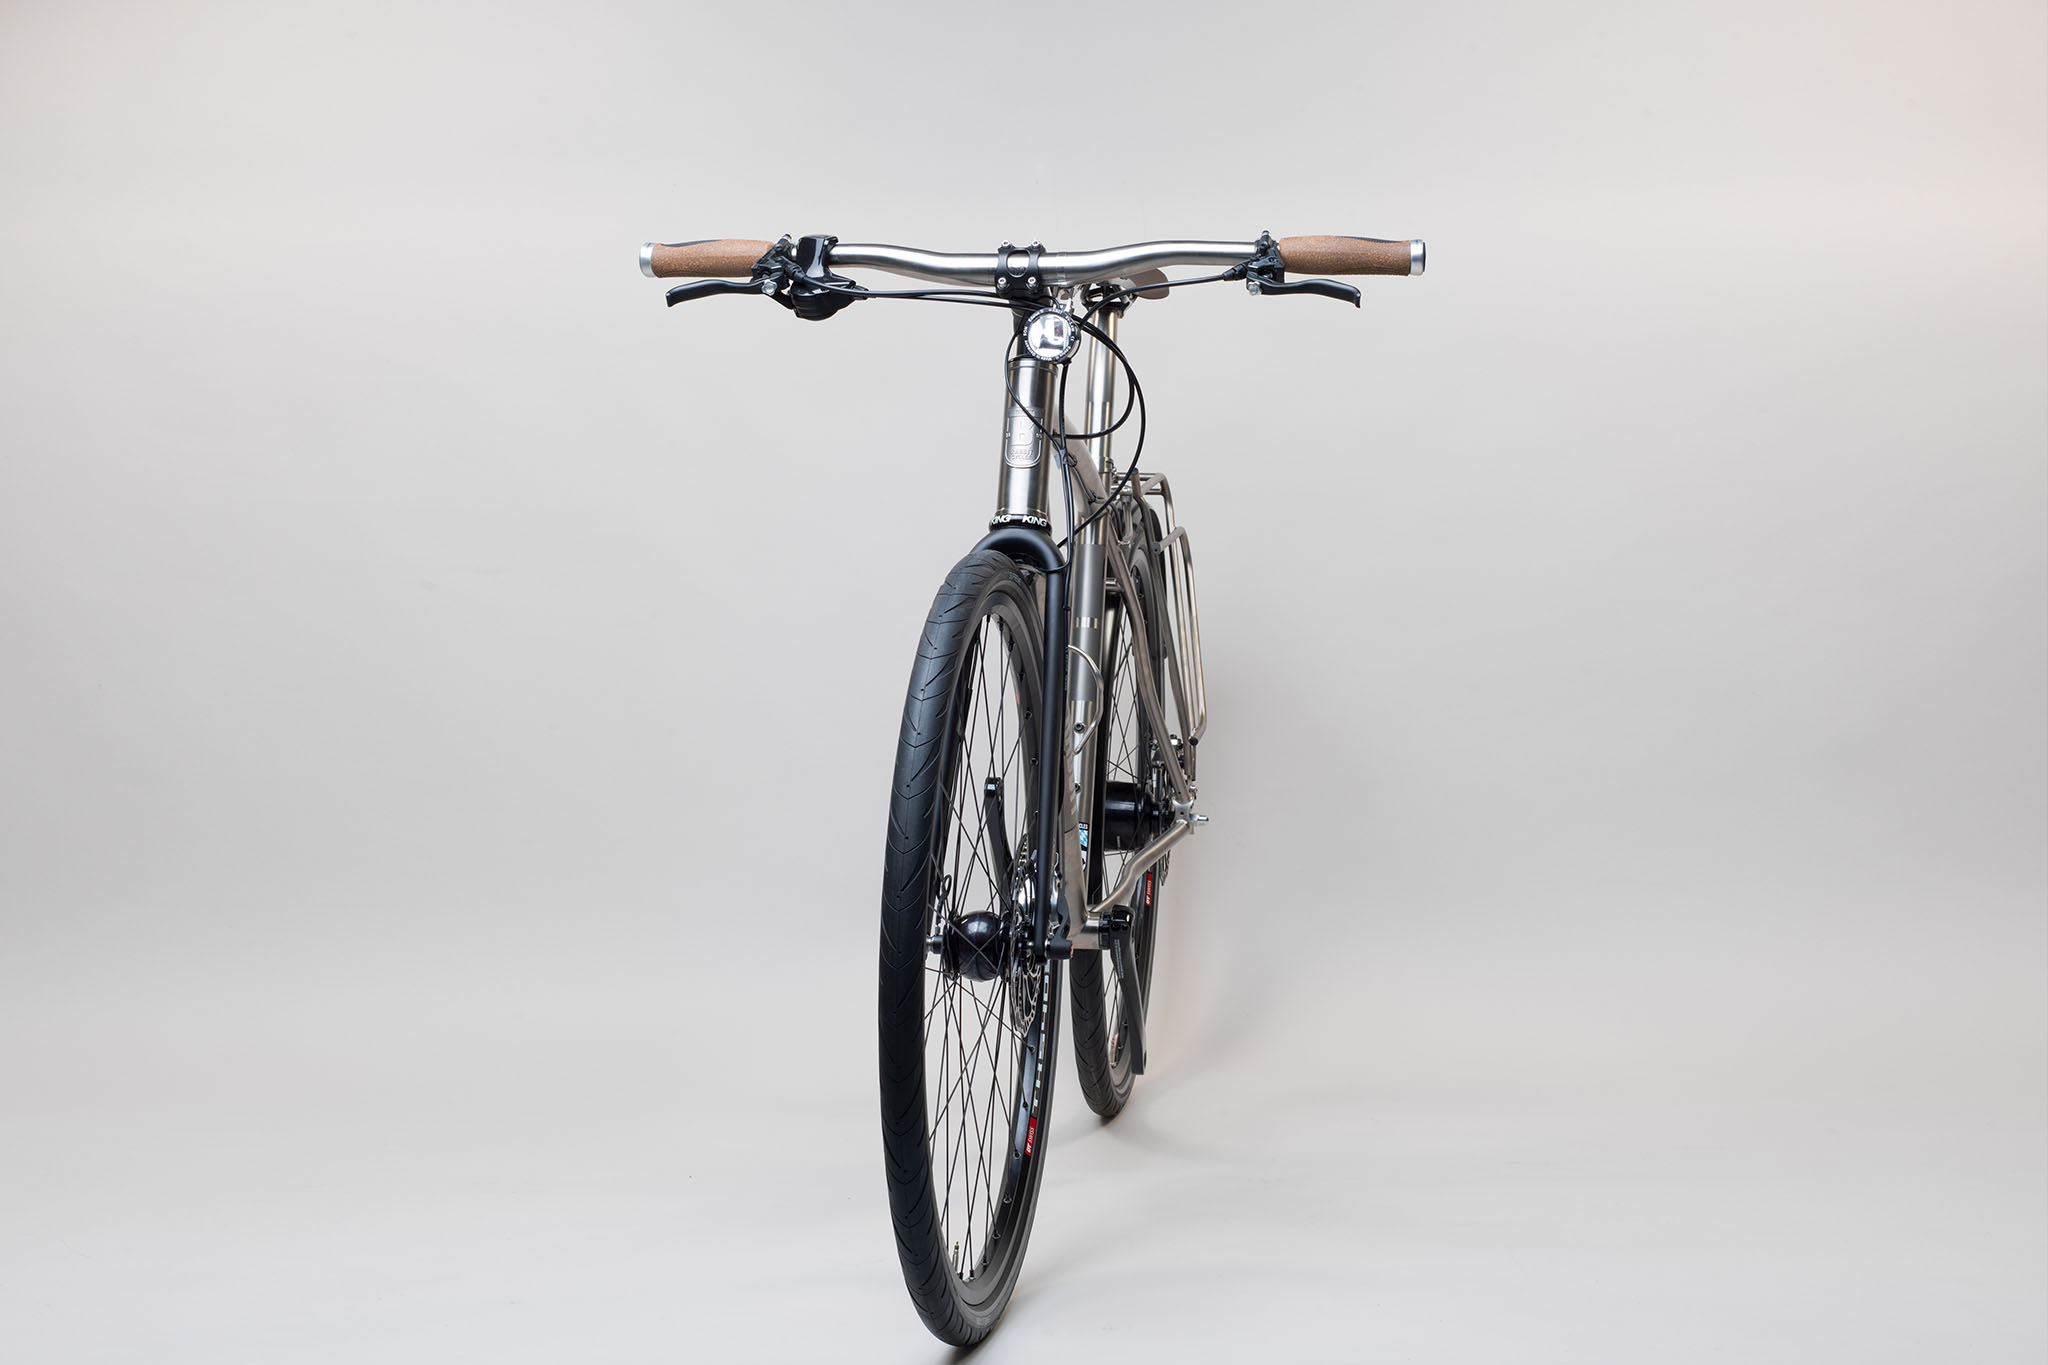 titan_commuter_37_from_rabbit_titan_cycles_bavaria